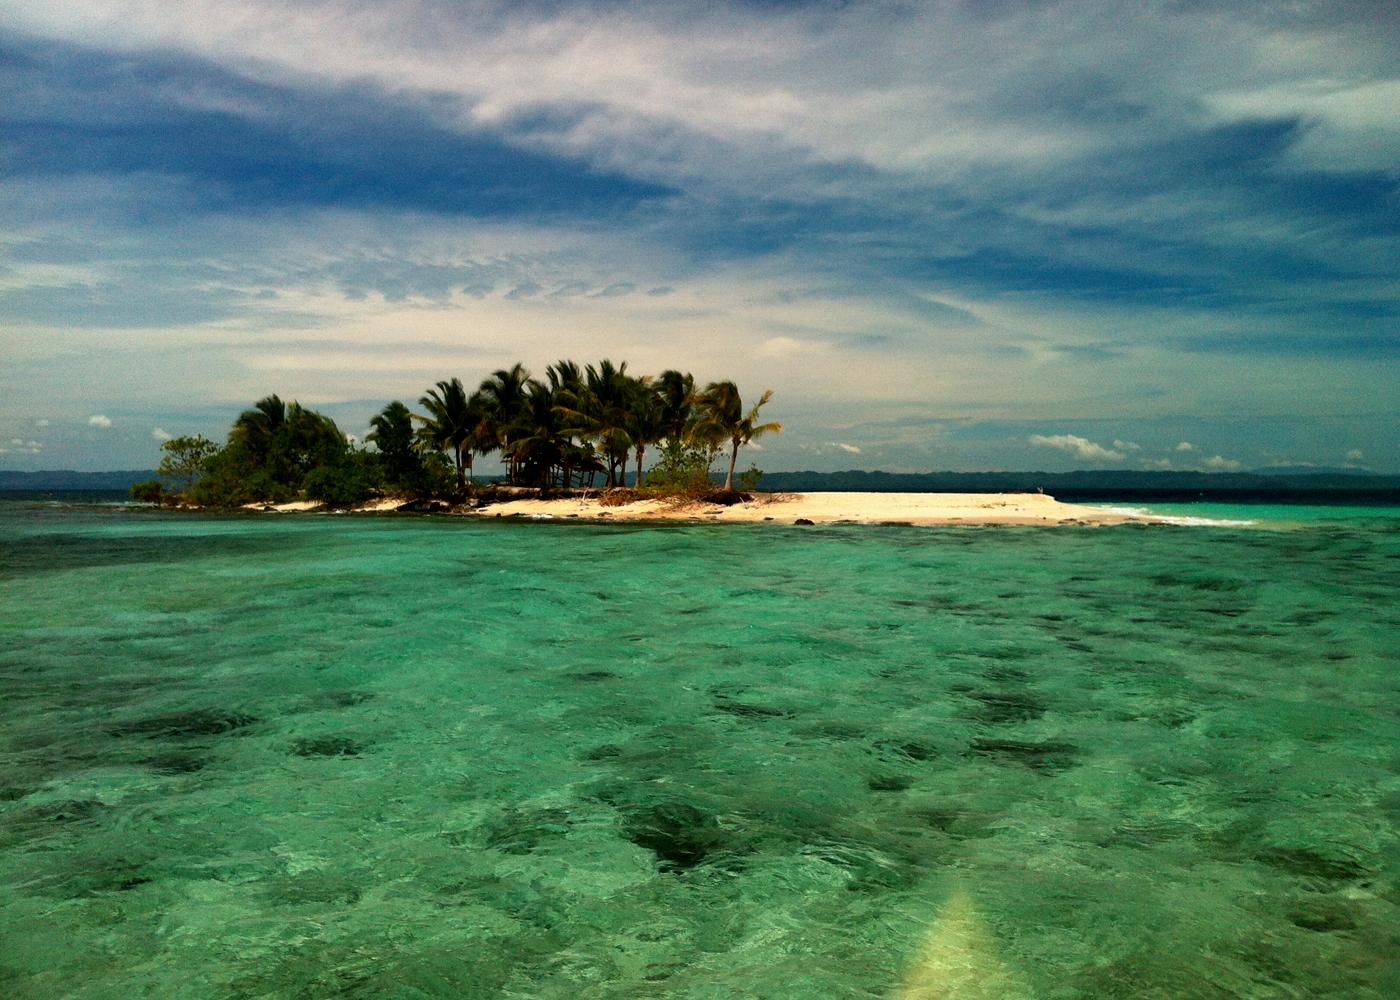 mySpot by Rachid: mySpot | Britania Group of Islands - San